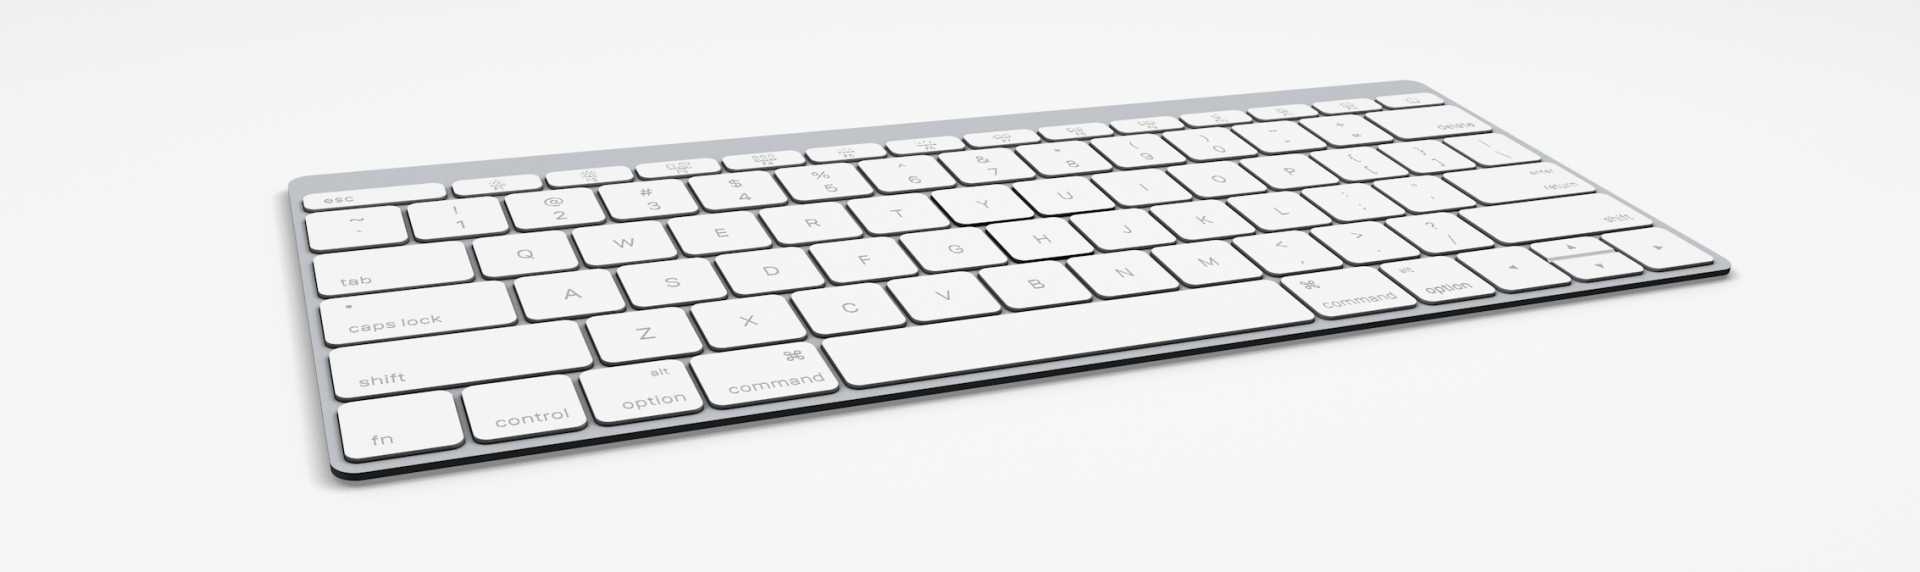 keyboard-angle-white-display